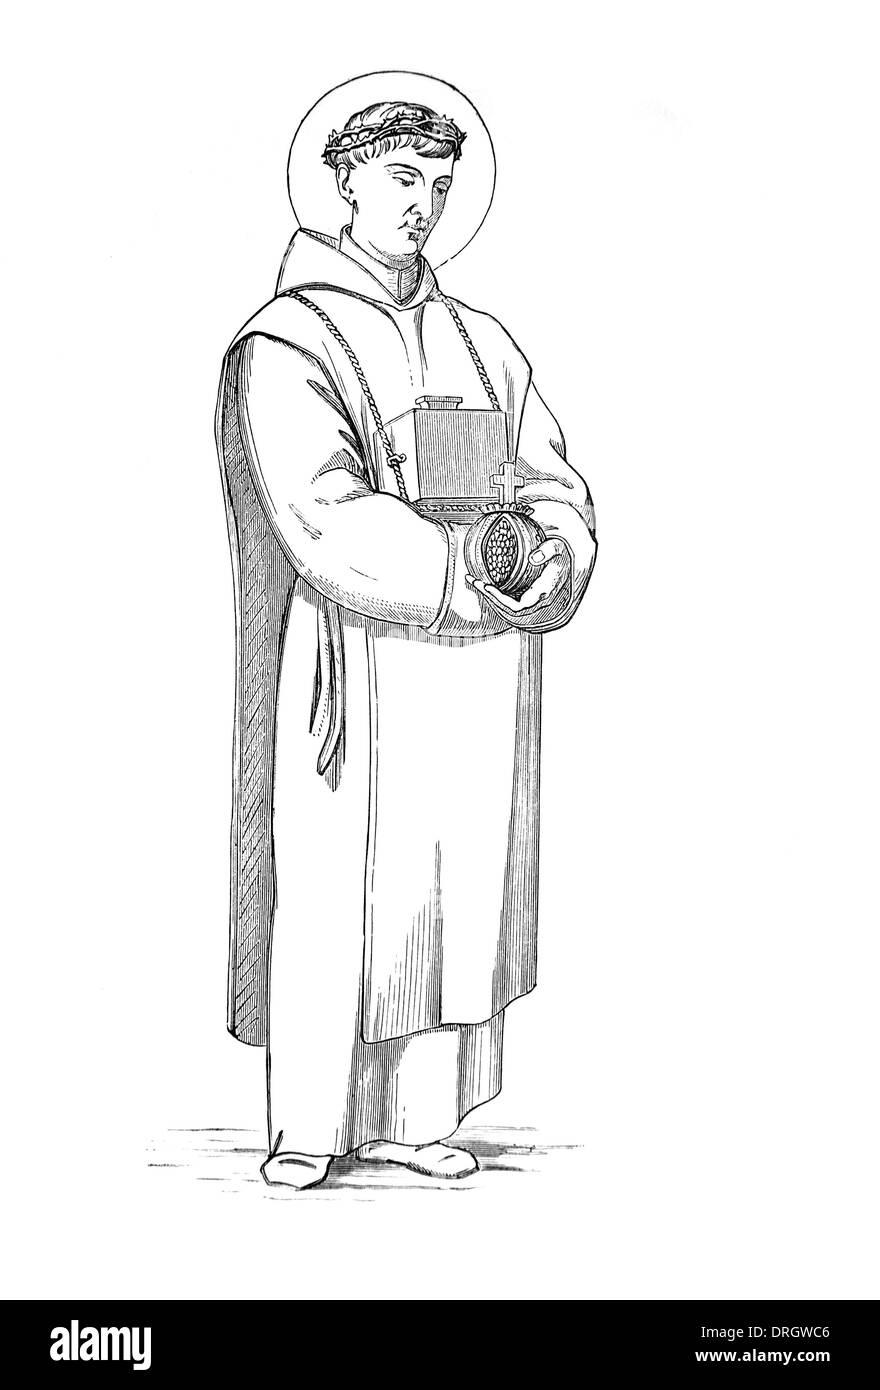 Saint John of God; Black and White Illustration - Stock Image